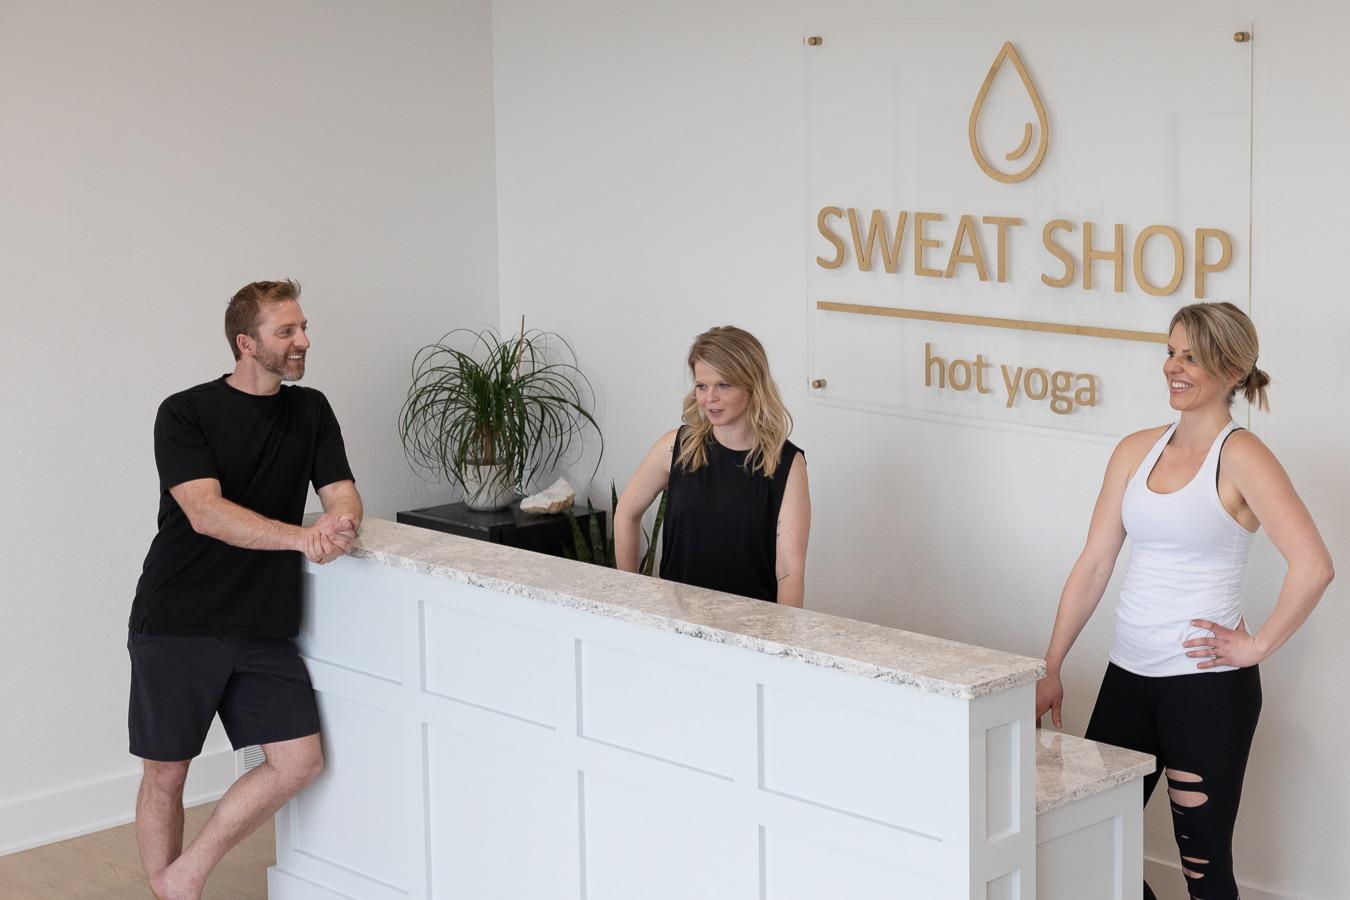 Sweat Shop Hot Yoga Oconomowoc Yoga Group Picture 2 Resize